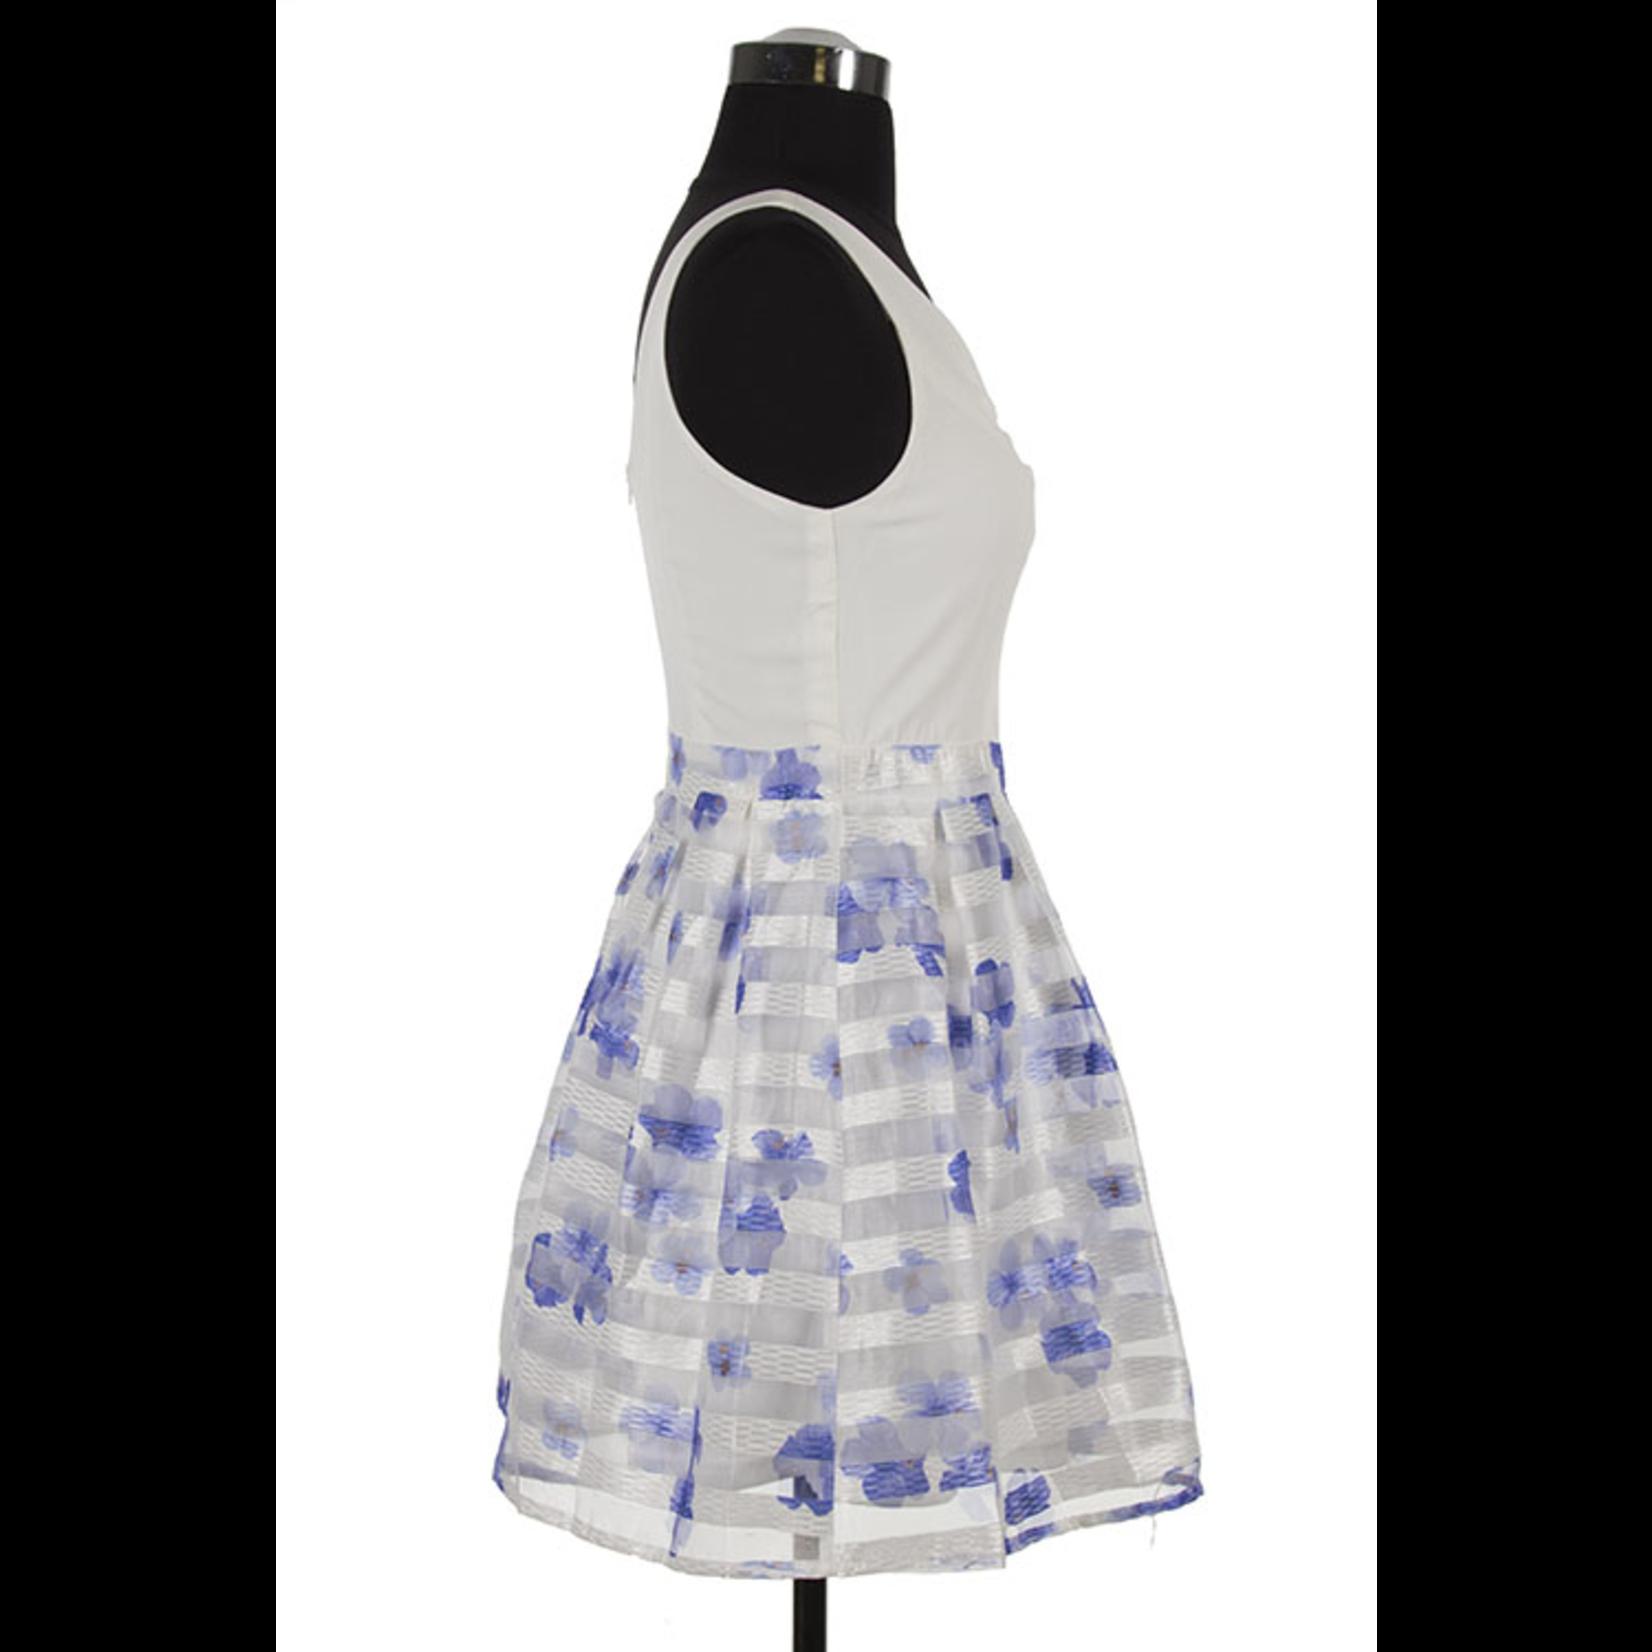 Decapolis Sleeveless, striped skirt dress, sale item, Was $62